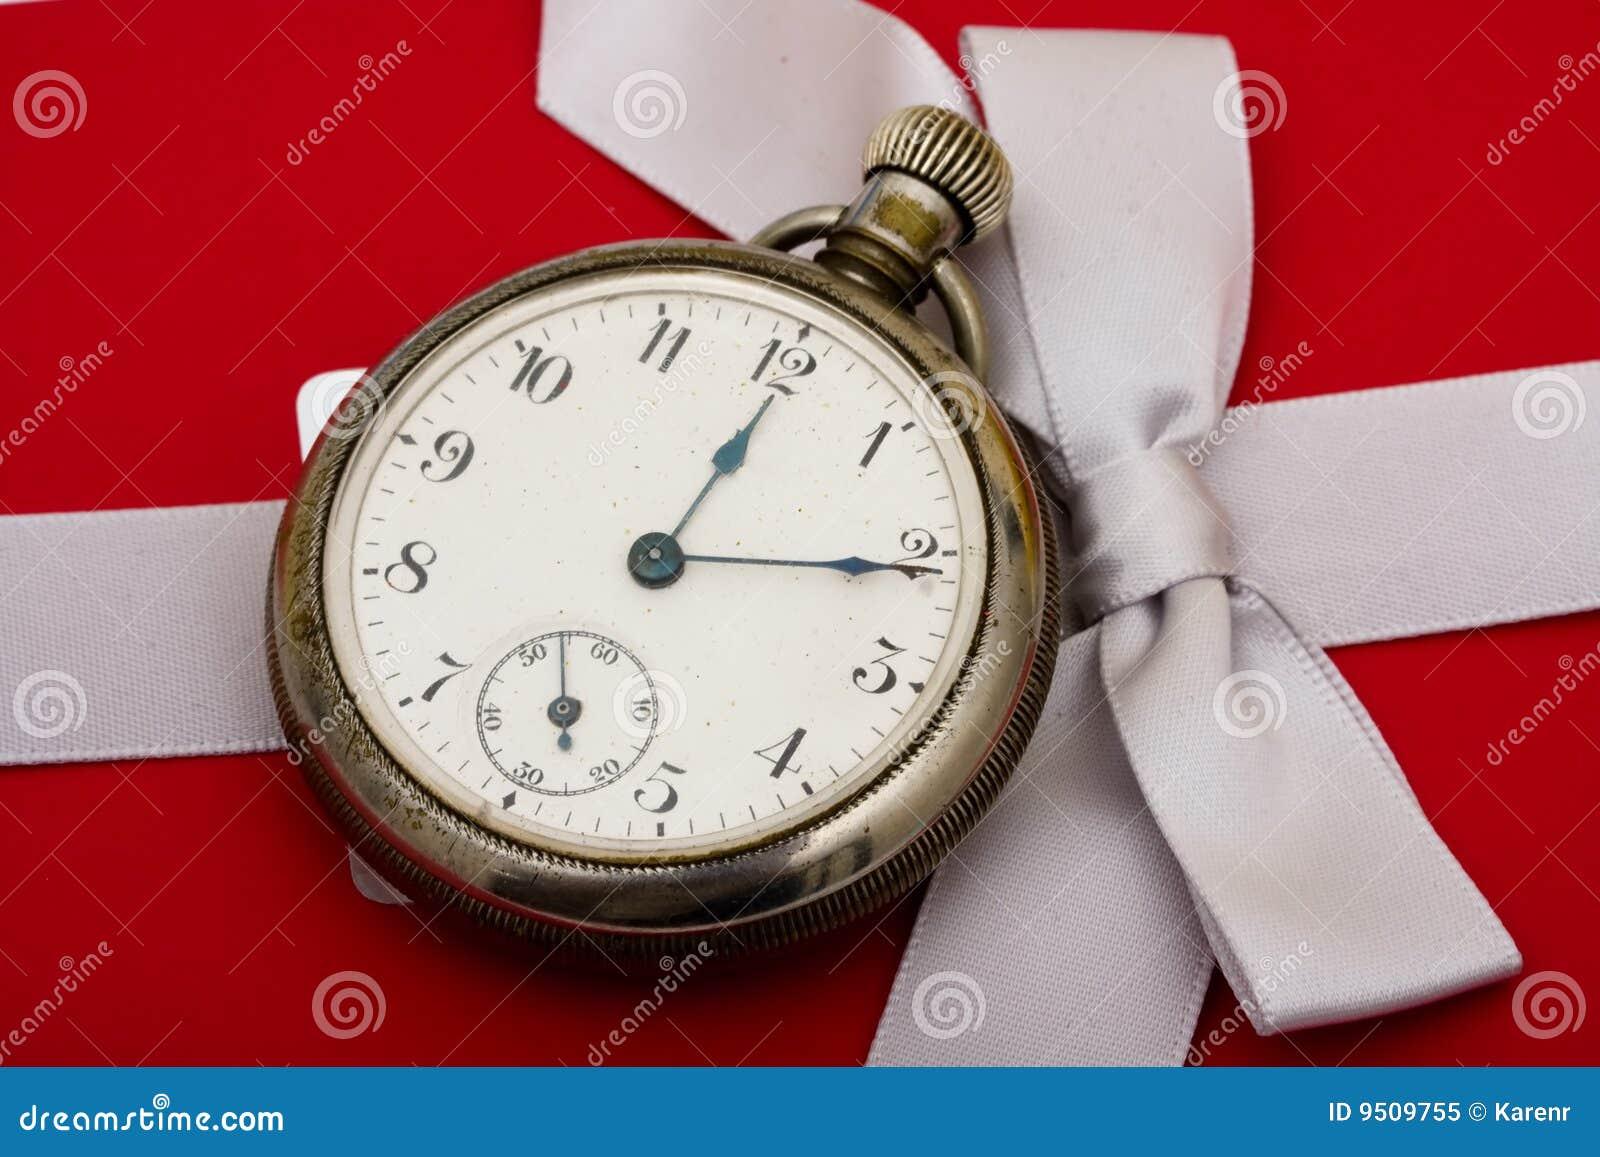 ck手表如何调时间_背景管理矿穴存在红色坐的时间手表.